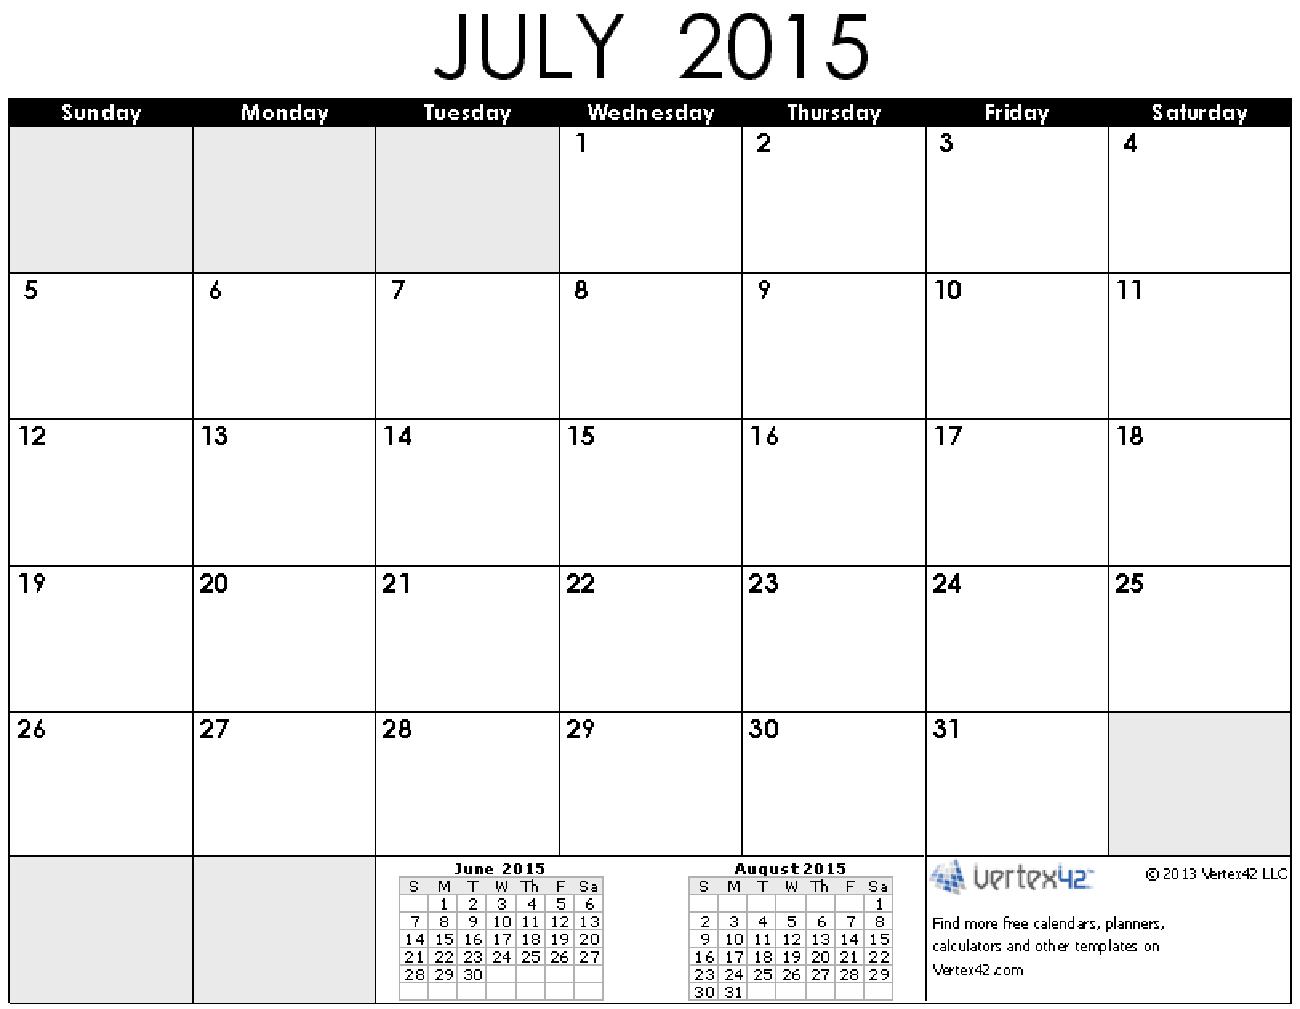 Free Printable Calendar 2015 Uk Printable Editable Blank – Word Template Calendar 2015